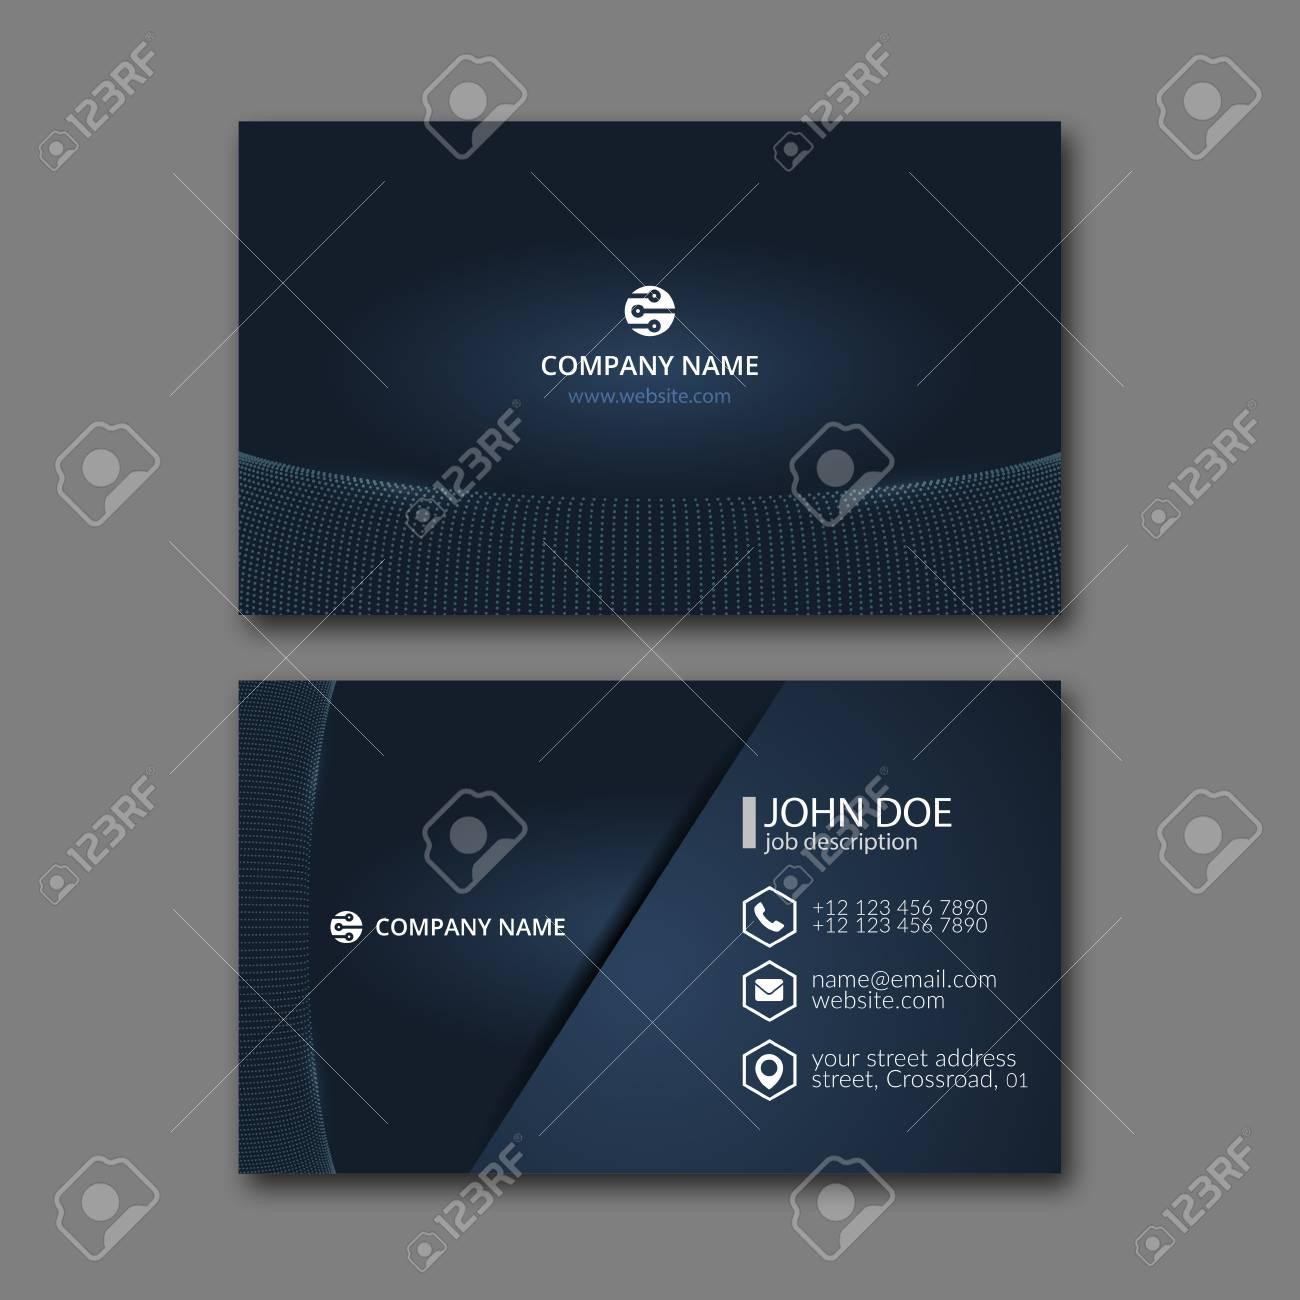 Elegant Business Card Design Template For Creative Design. Royalty ...